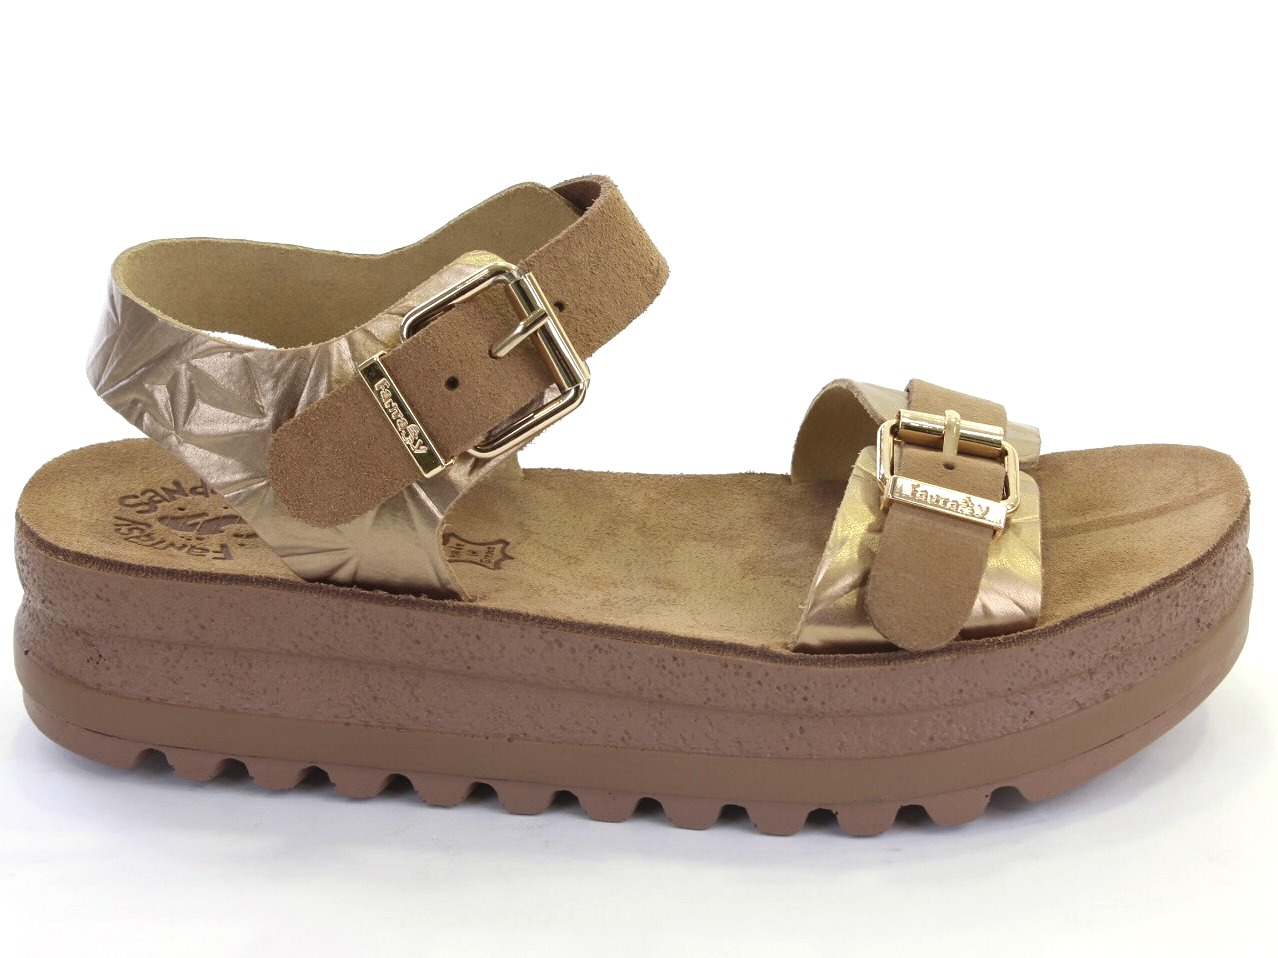 Sandálias Baixas Fantasy Sandals - 662 S103 ELODIE